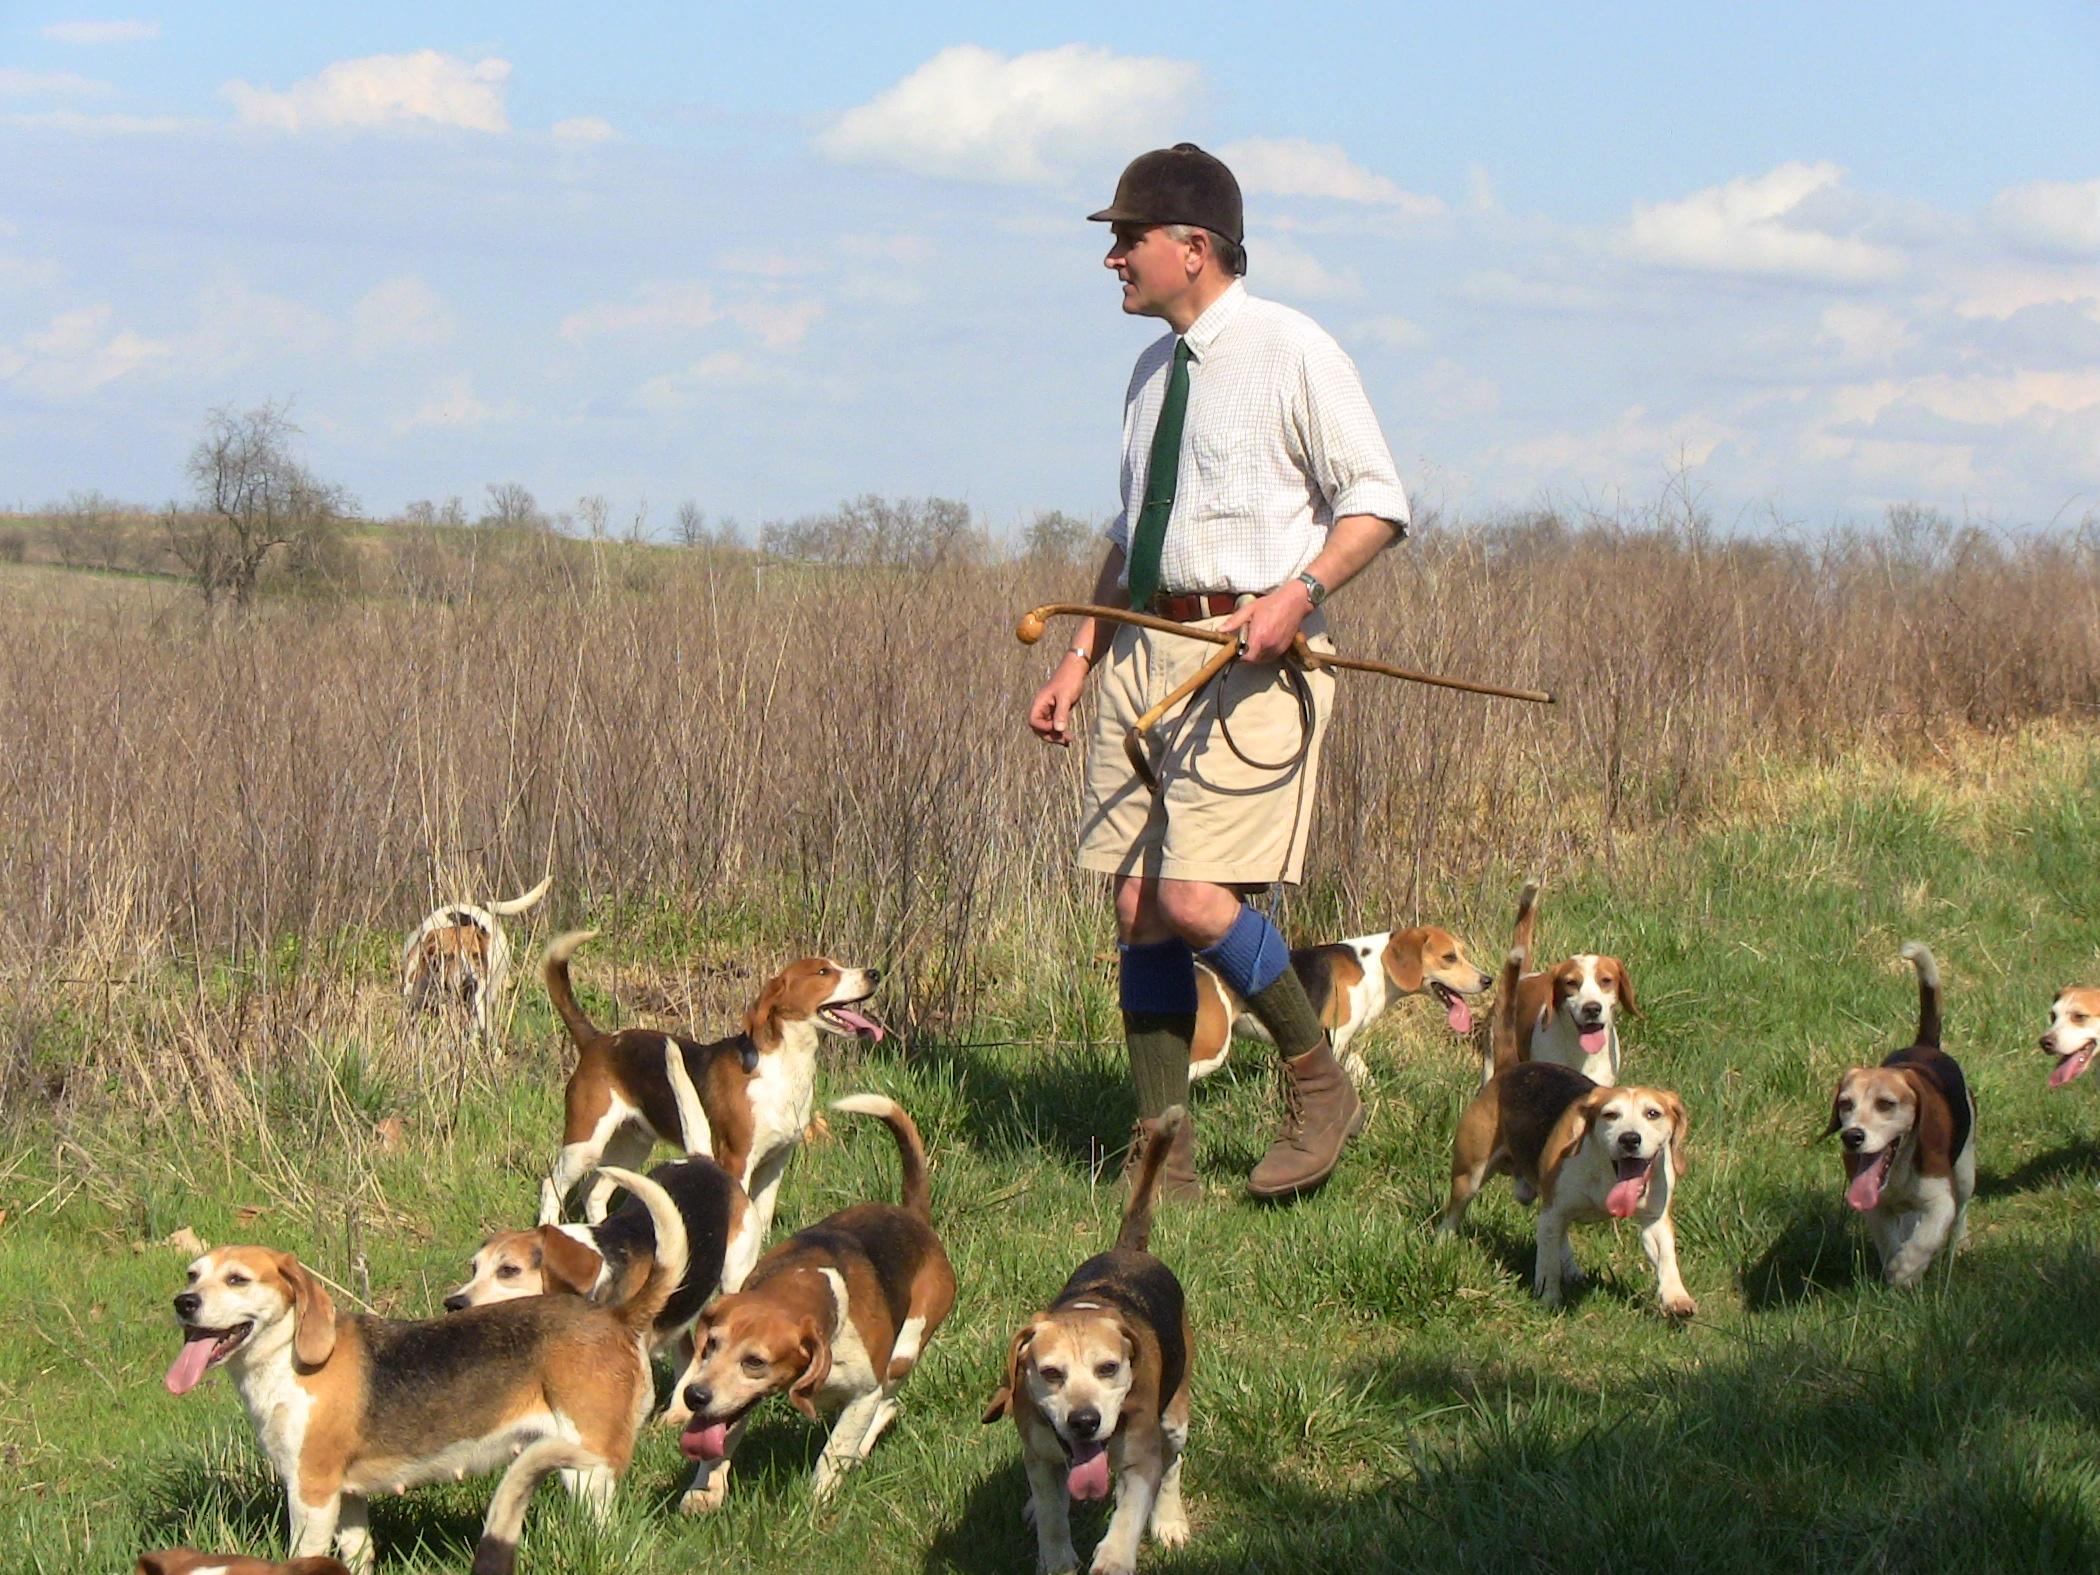 Beagle hunting - photo#43